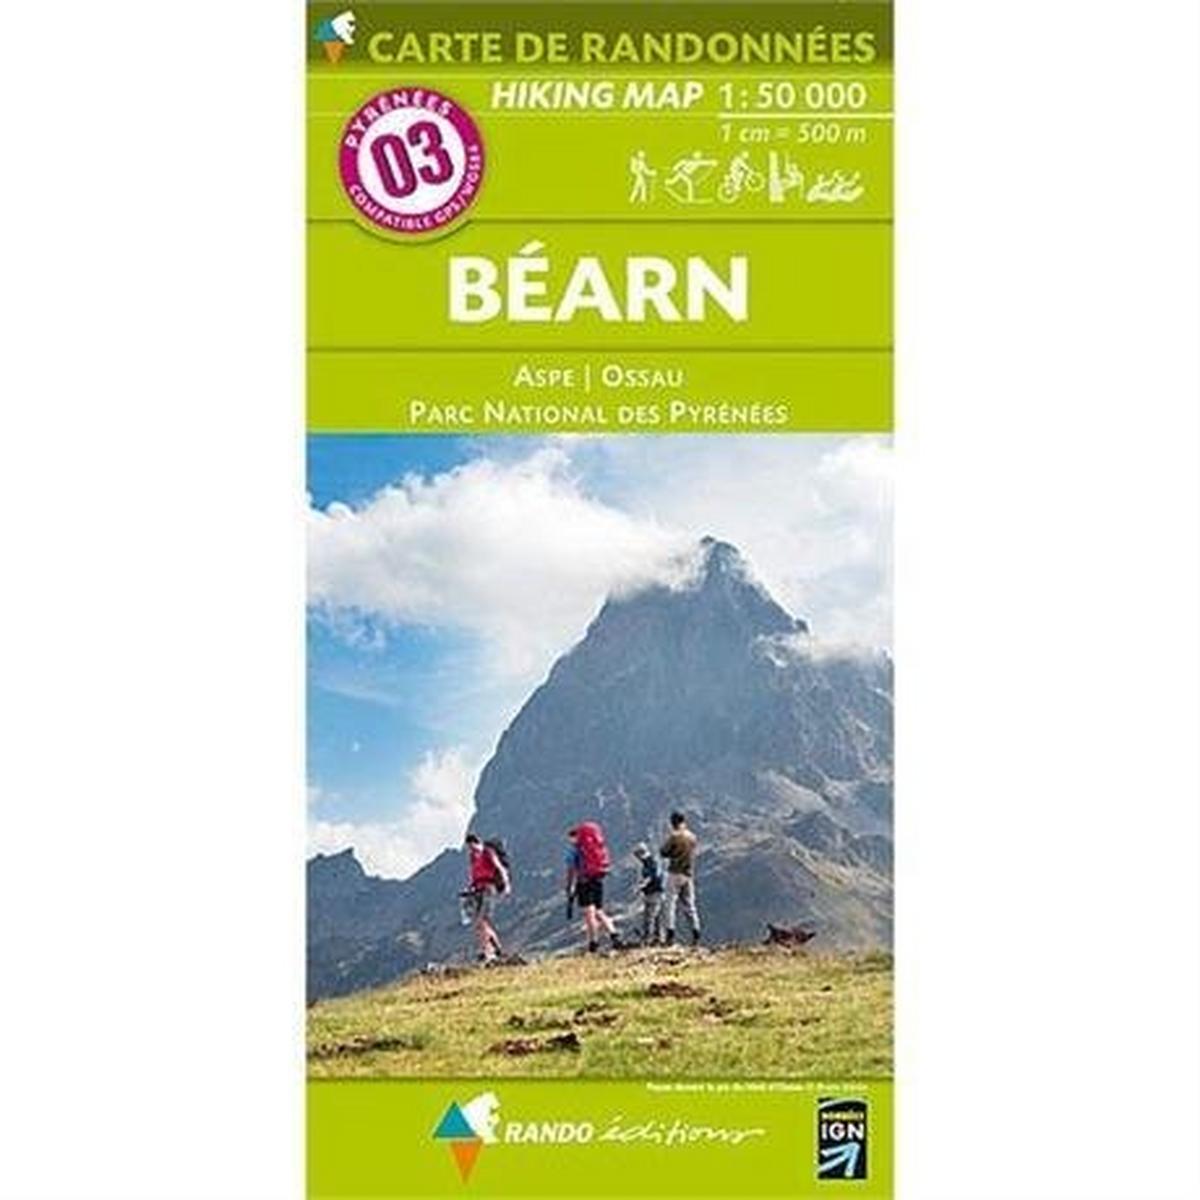 Ign Maps France IGN Map Rando Editions Bearn